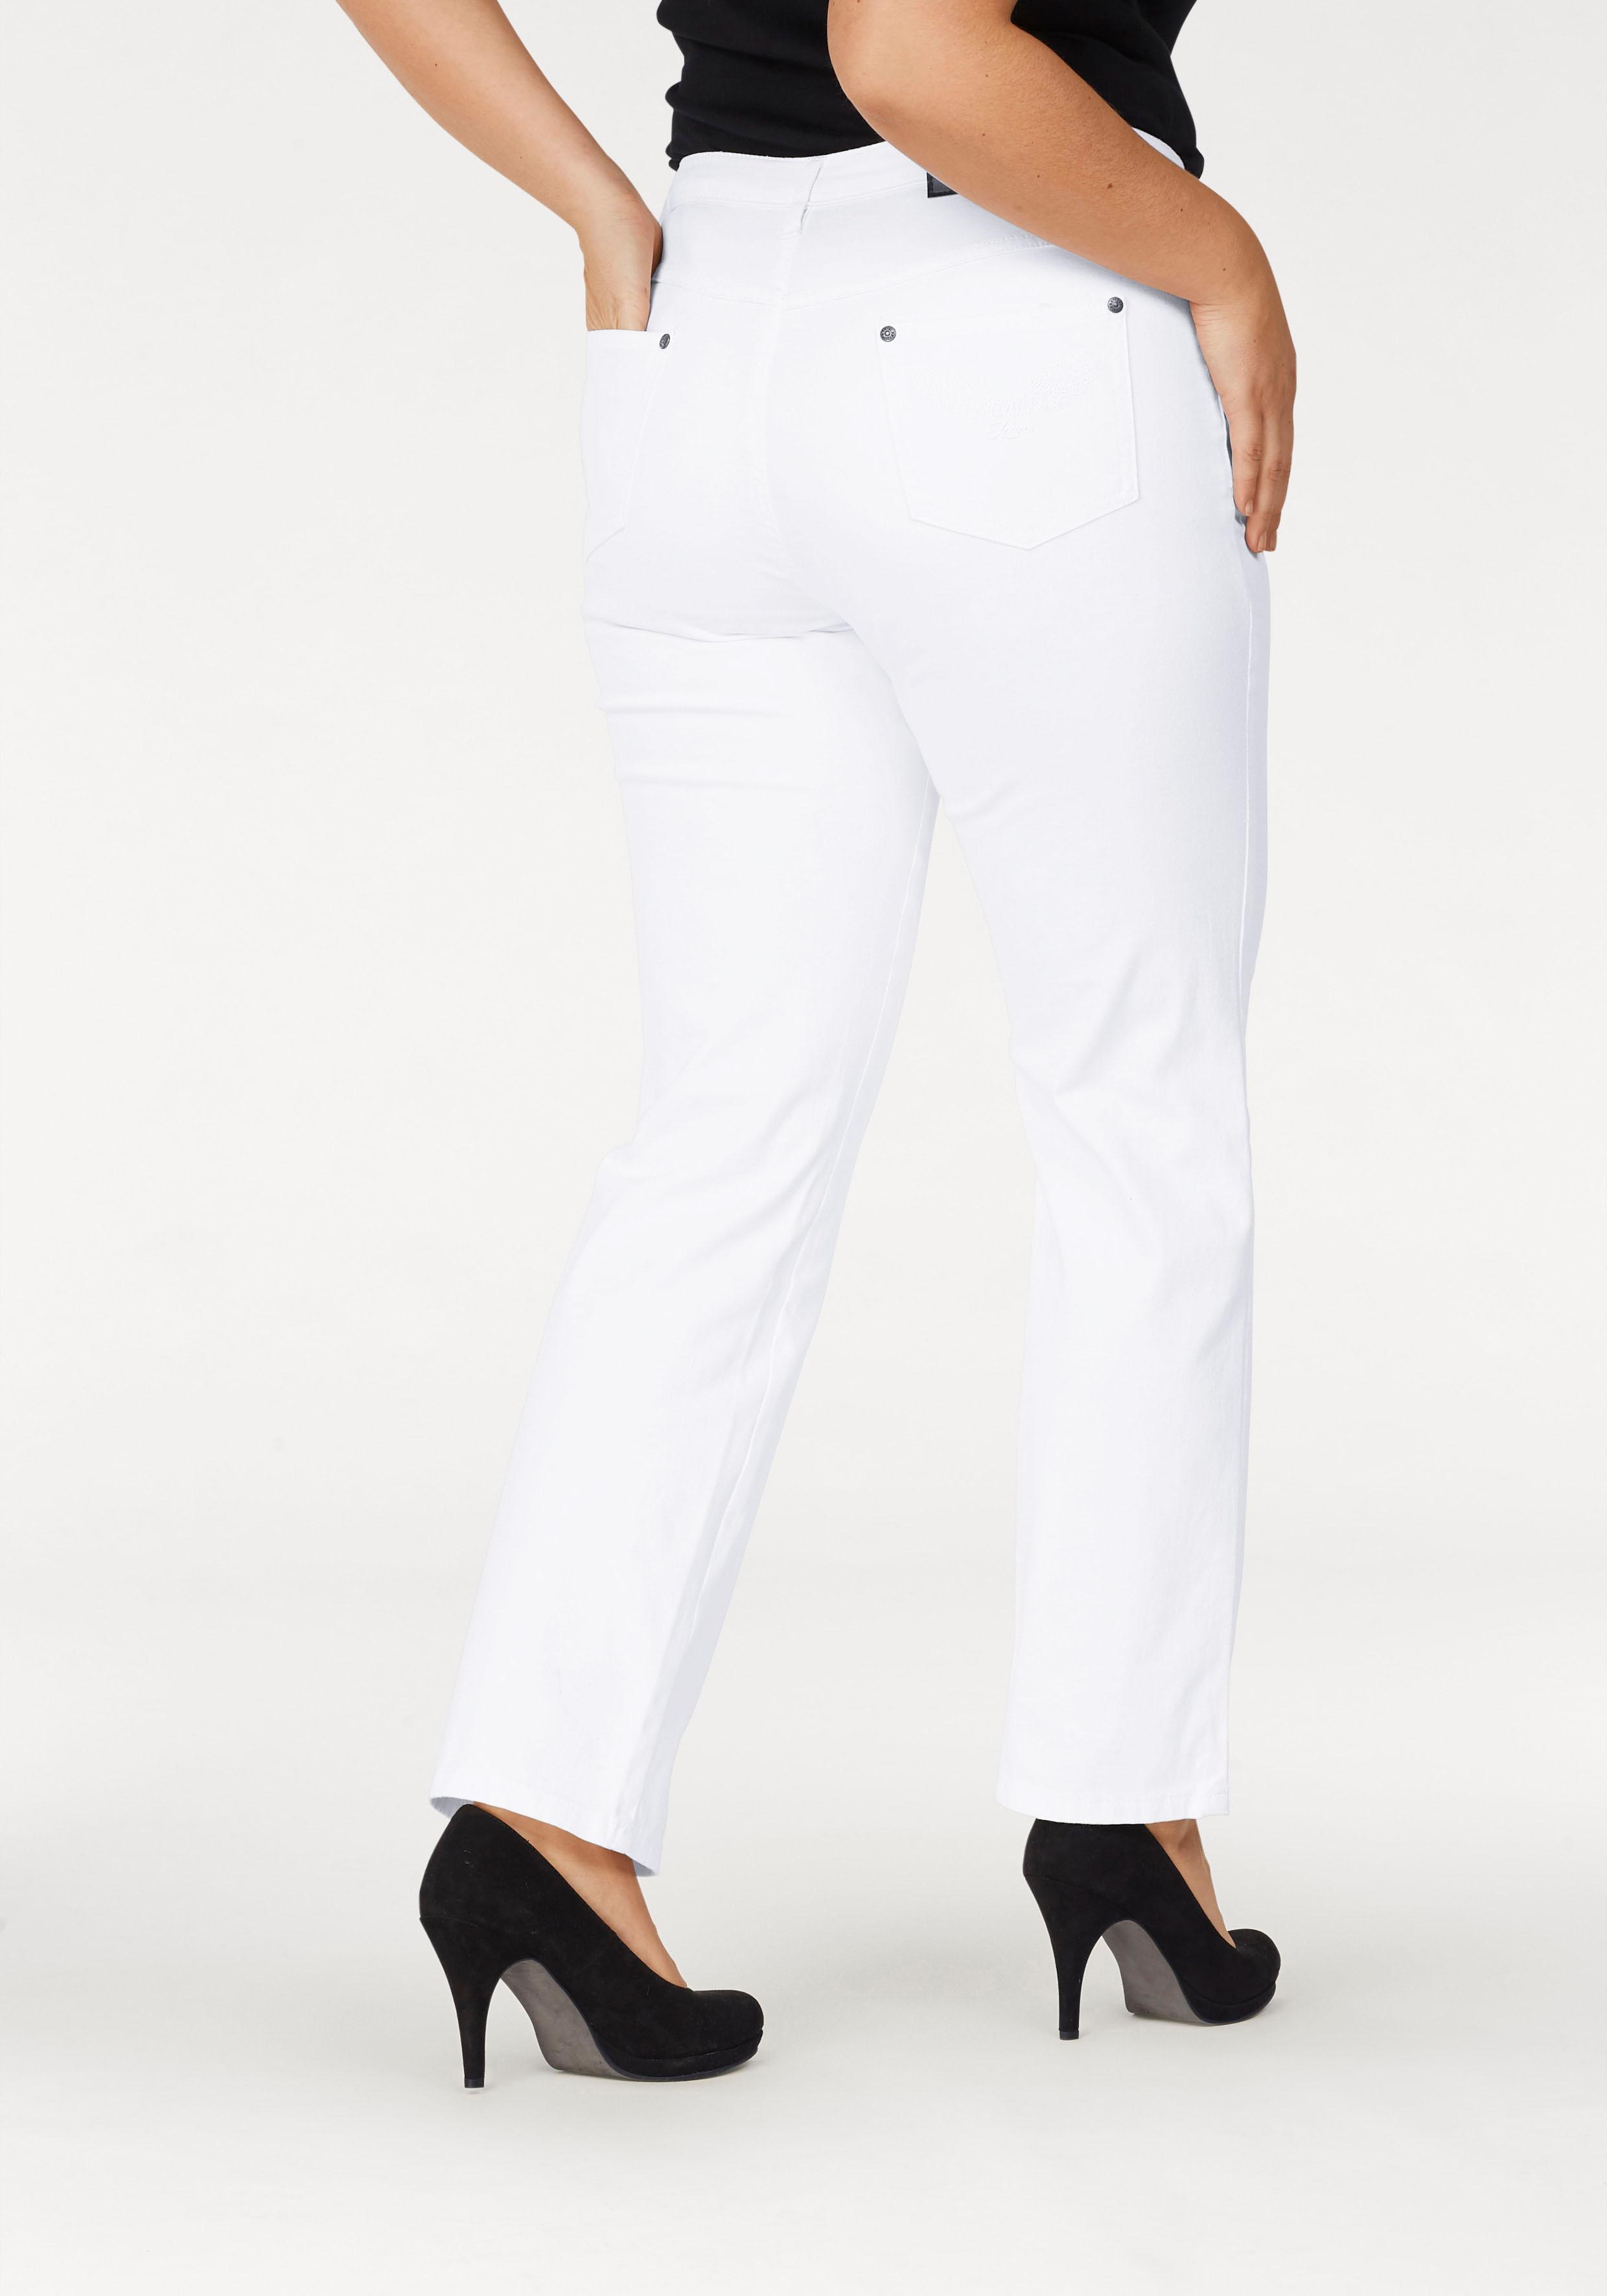 Arizona Gerade Jeans Comfort-Fit   Bekleidung > Jeans > Gerade Jeans   Weiß   Arizona